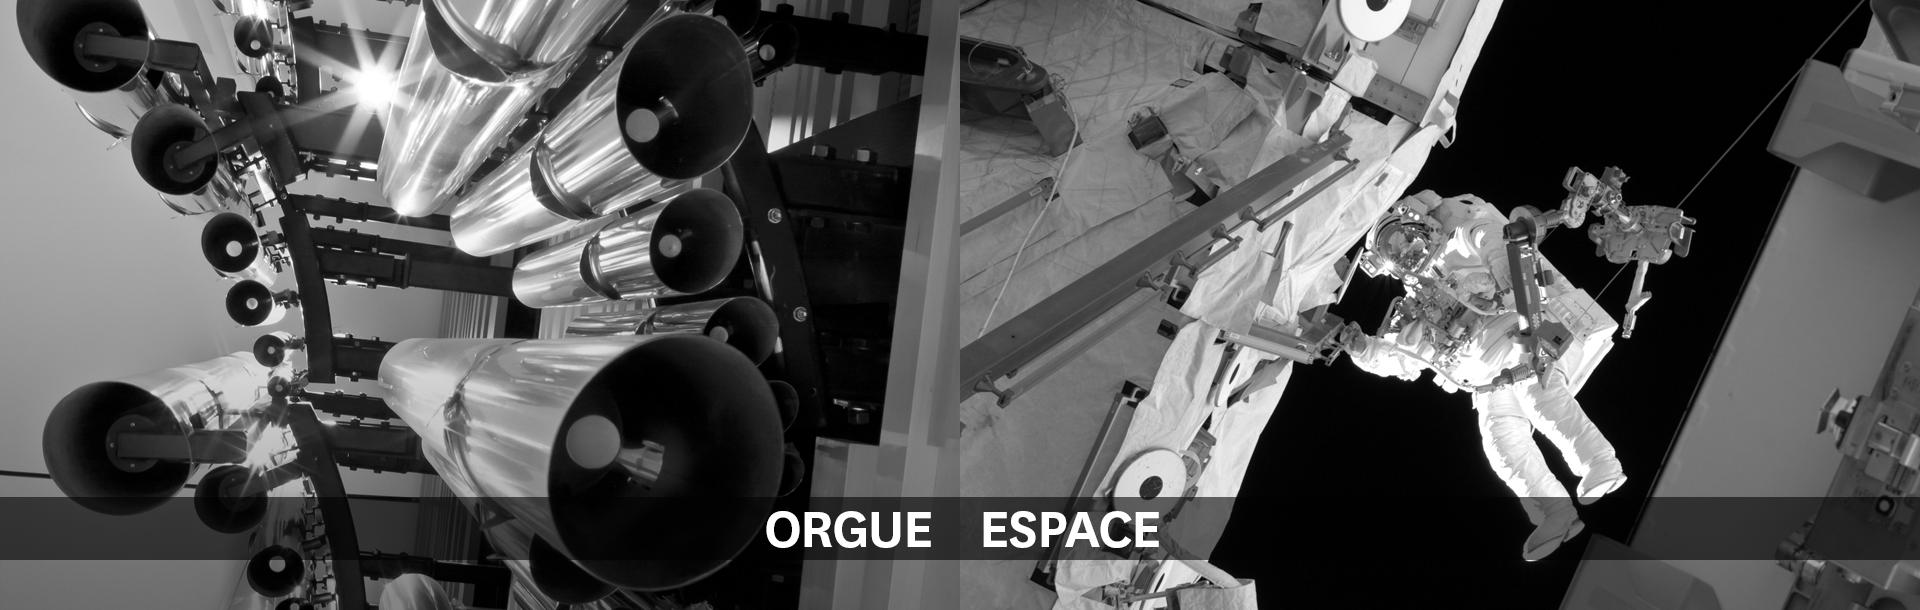 web - Montage Orgue - Espace - V2